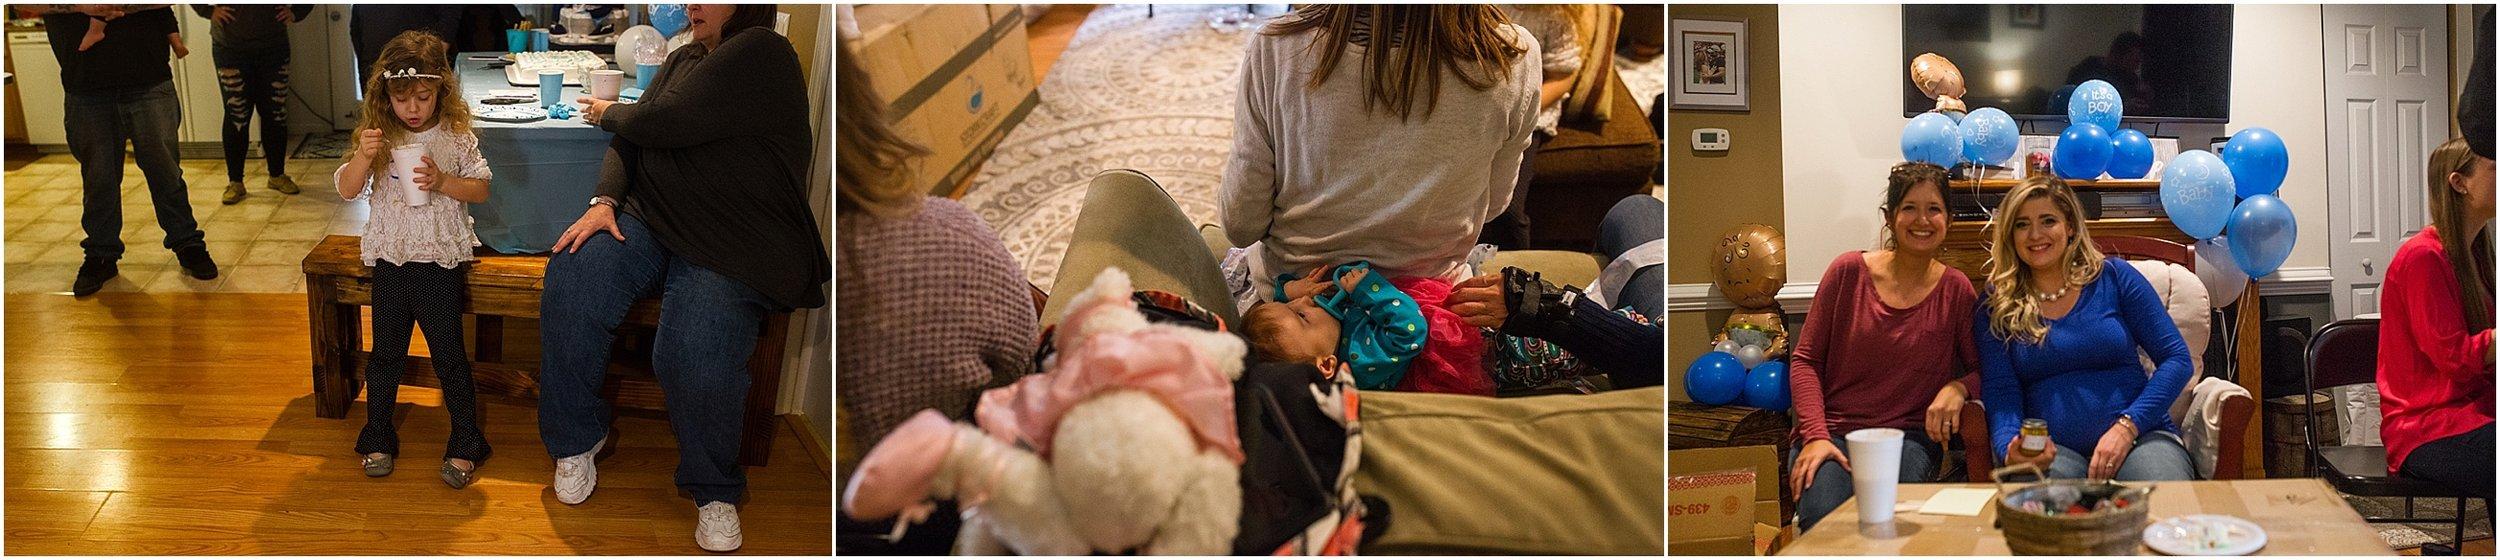 baby shower, Holli Pool Photography, Stuarts Draft, Virginia photographer